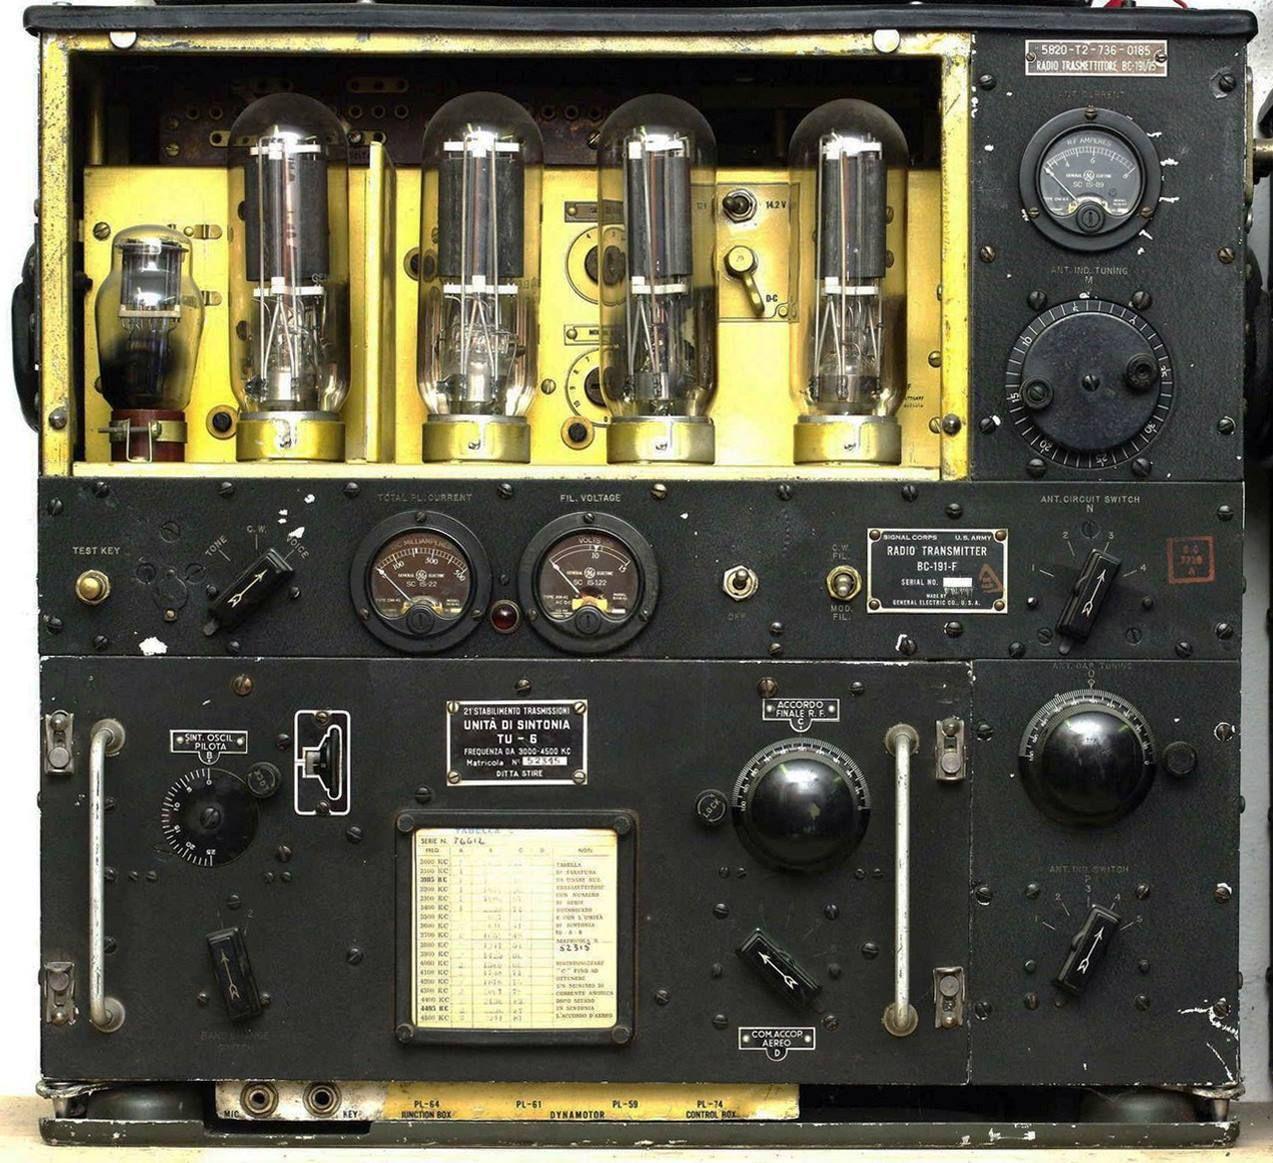 BC-191-F Transmitter   Vintage Technology   Ham radio, Amp